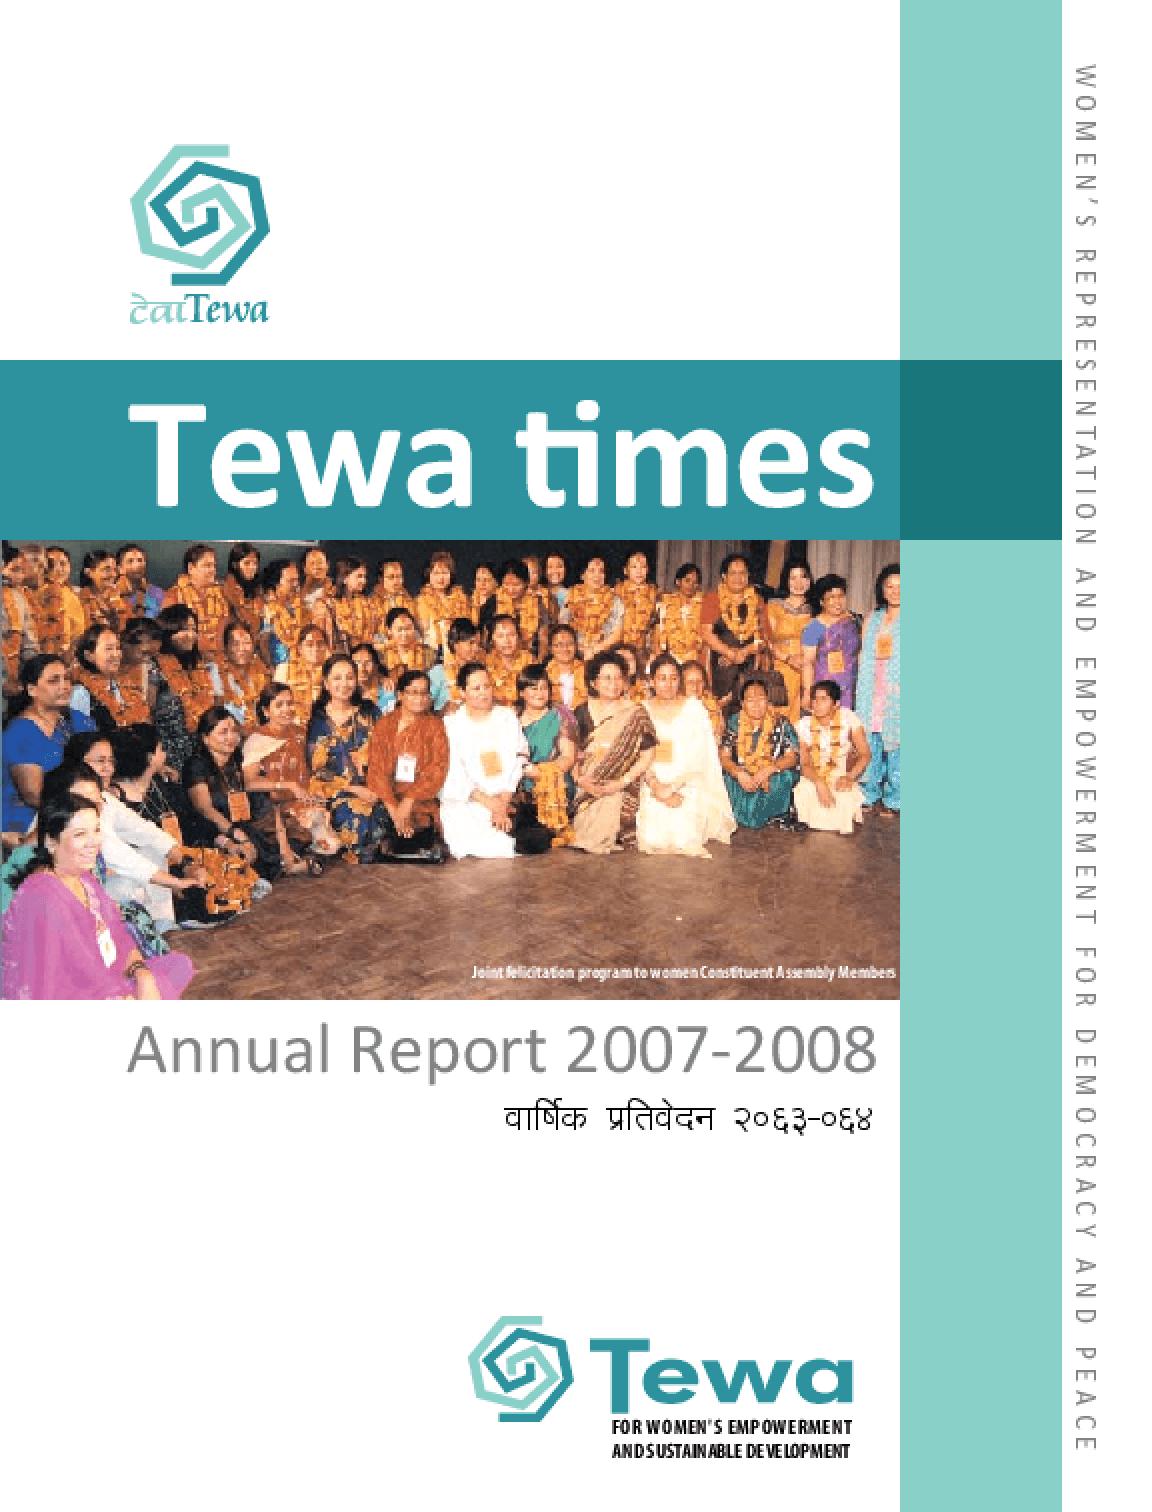 Tewa, Annual Report 2007-2008